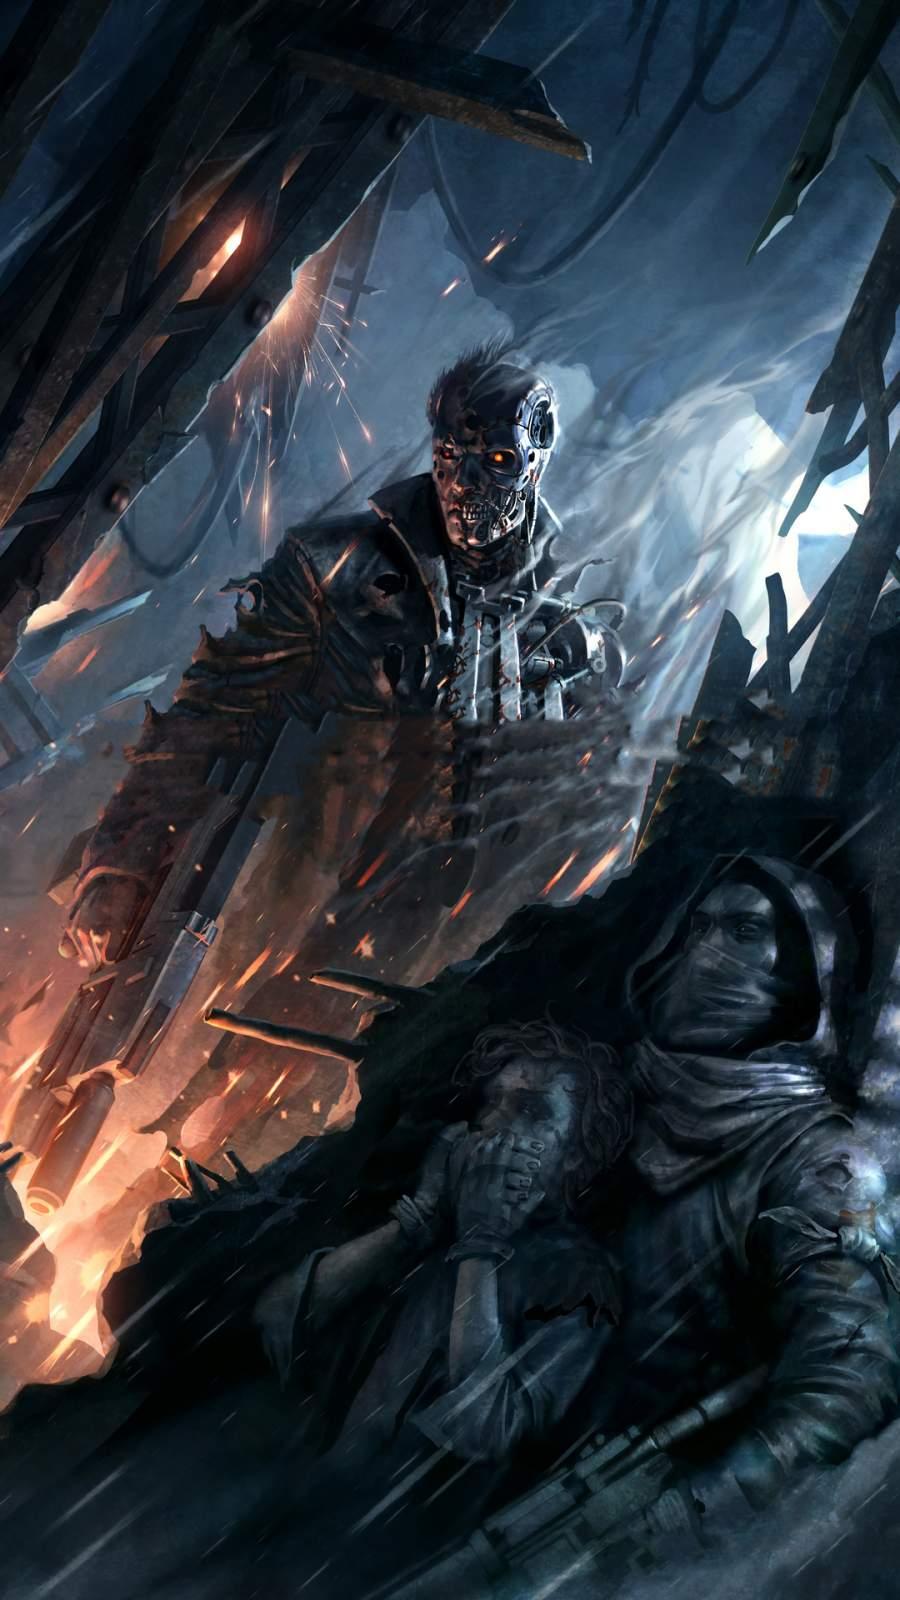 Terminator Game iPhone Wallpaper